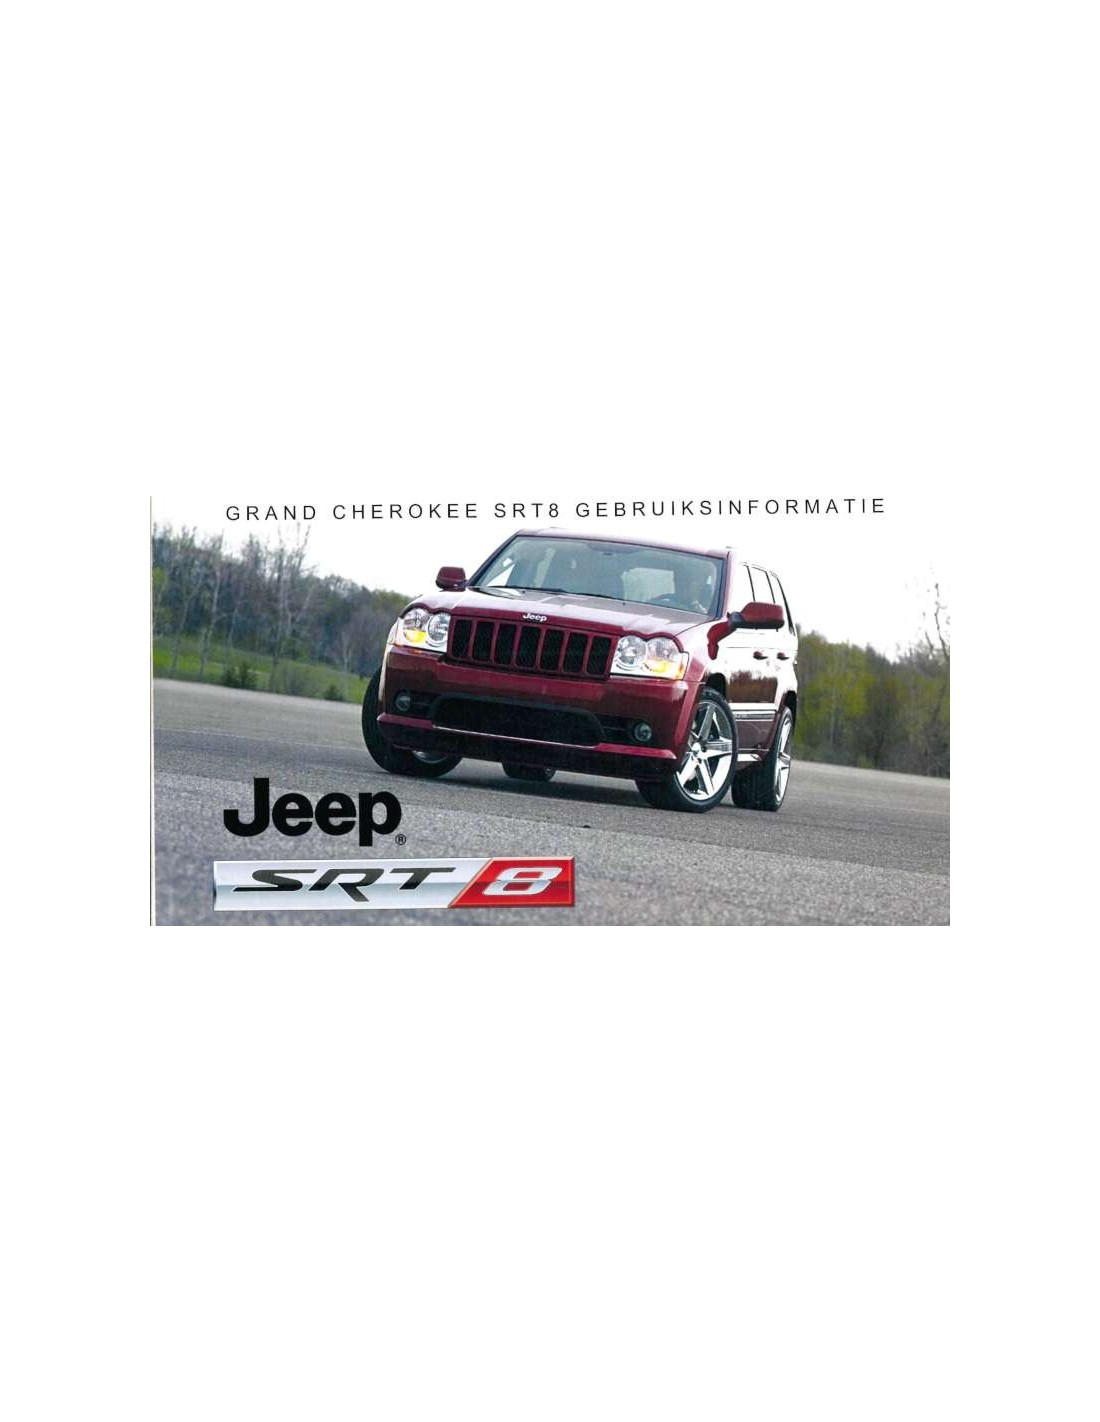 2007 jeep grand cherokee srt8 owner s manual dutch rh autolit eu 2007 Jeep SRT8 White 2006 Jeep SRT8